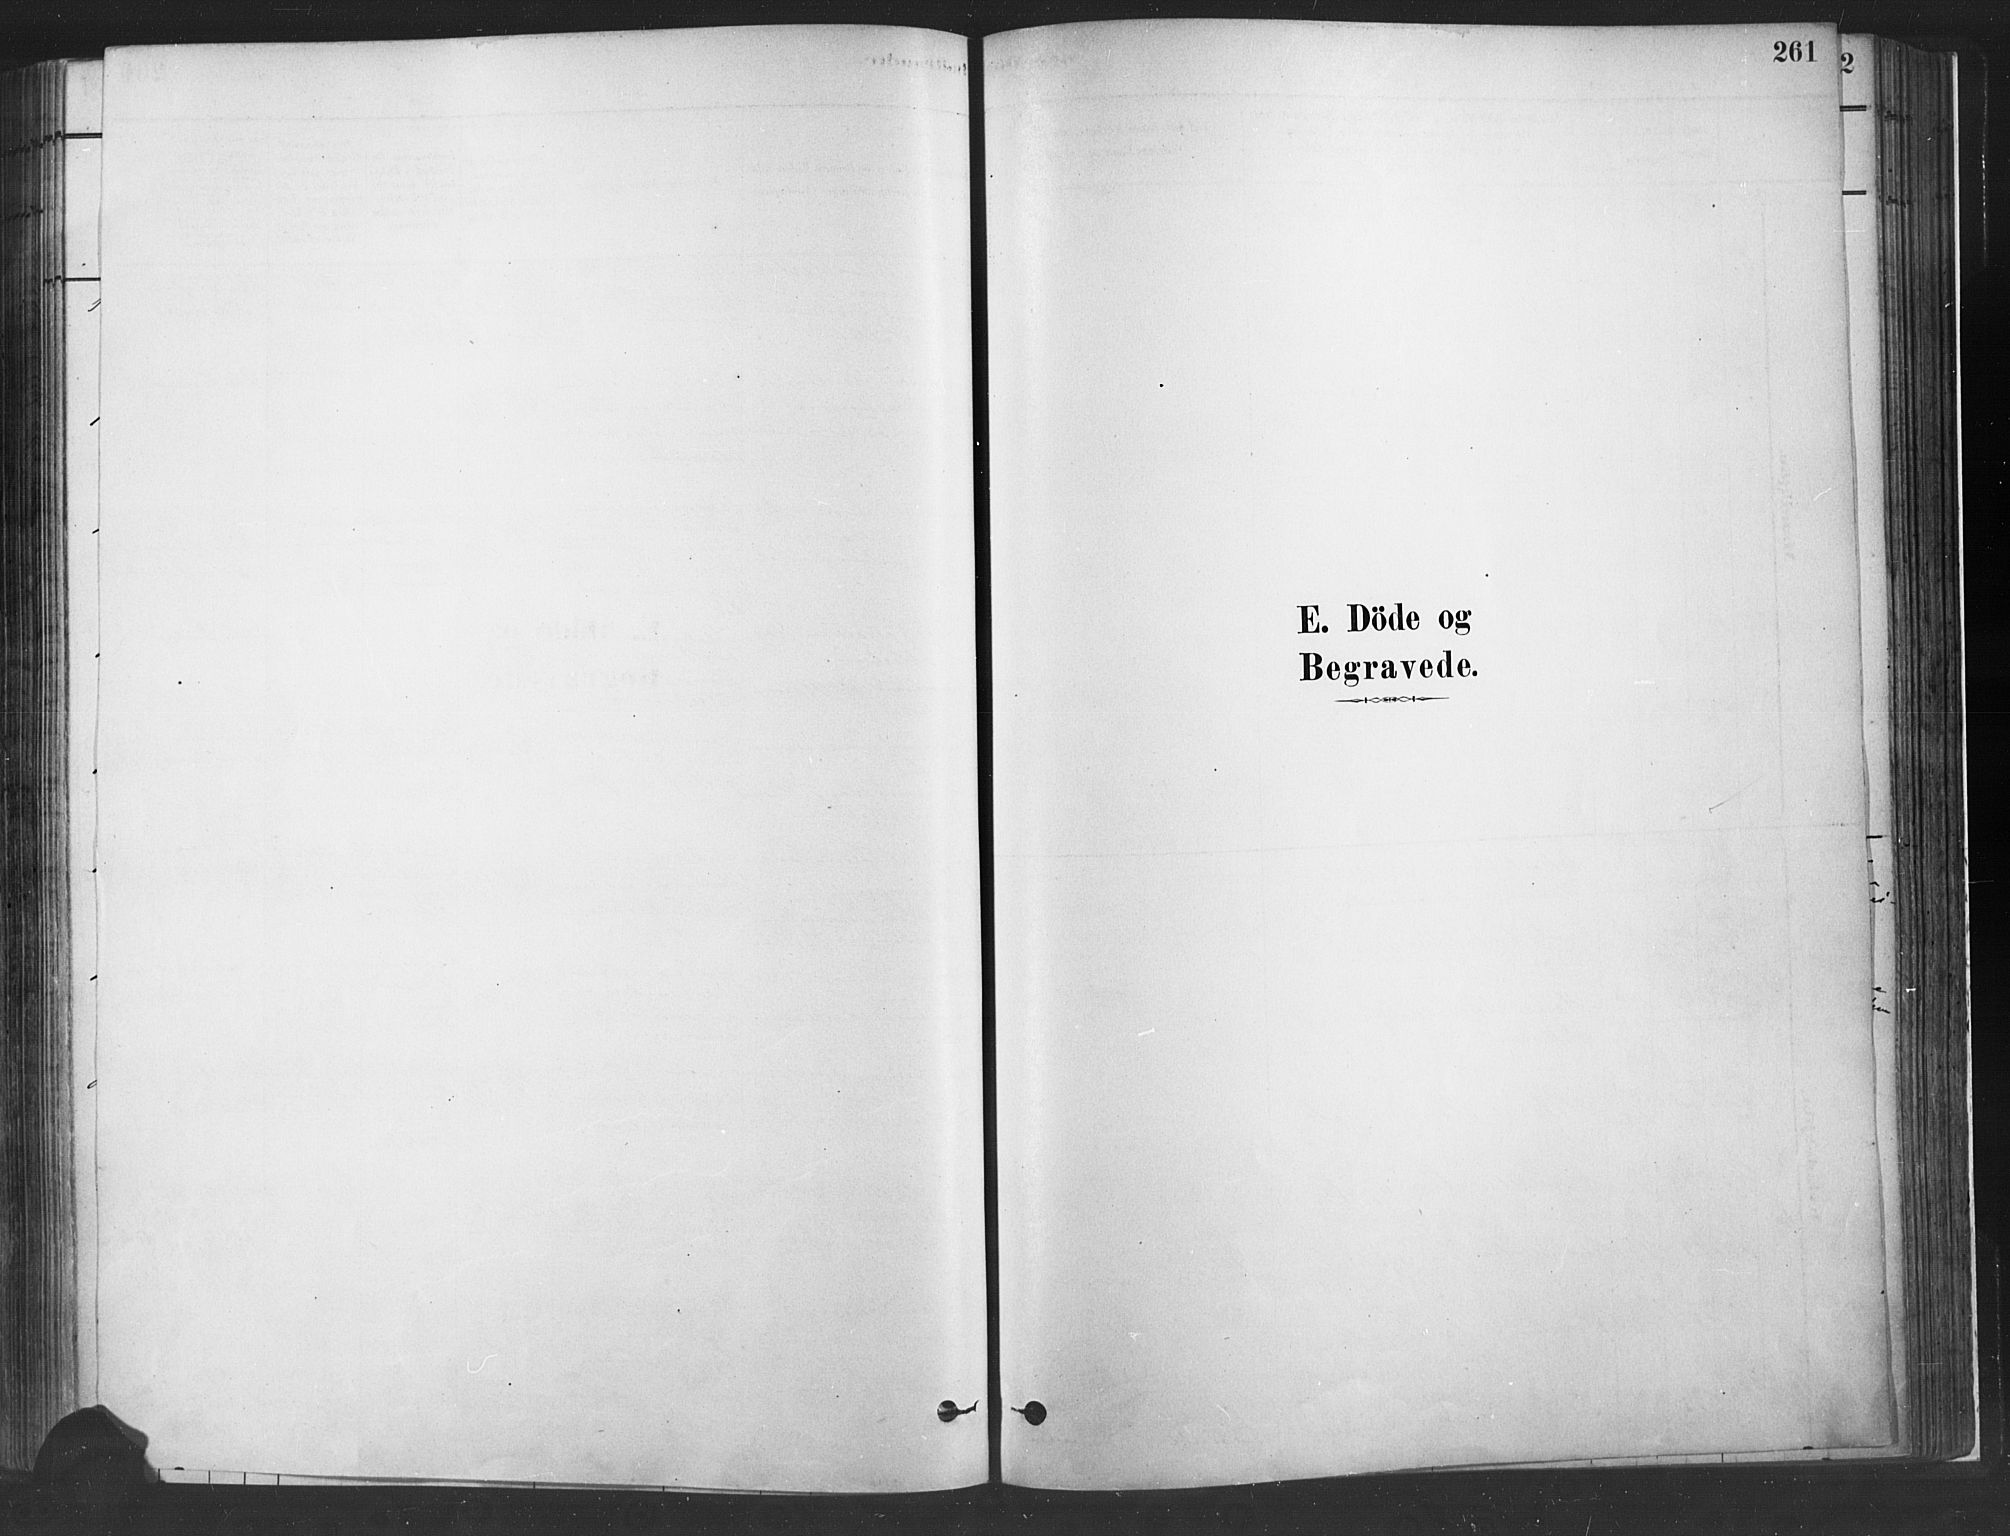 SAH, Fåberg prestekontor, H/Ha/Haa/L0010: Parish register (official) no. 10, 1879-1900, p. 261